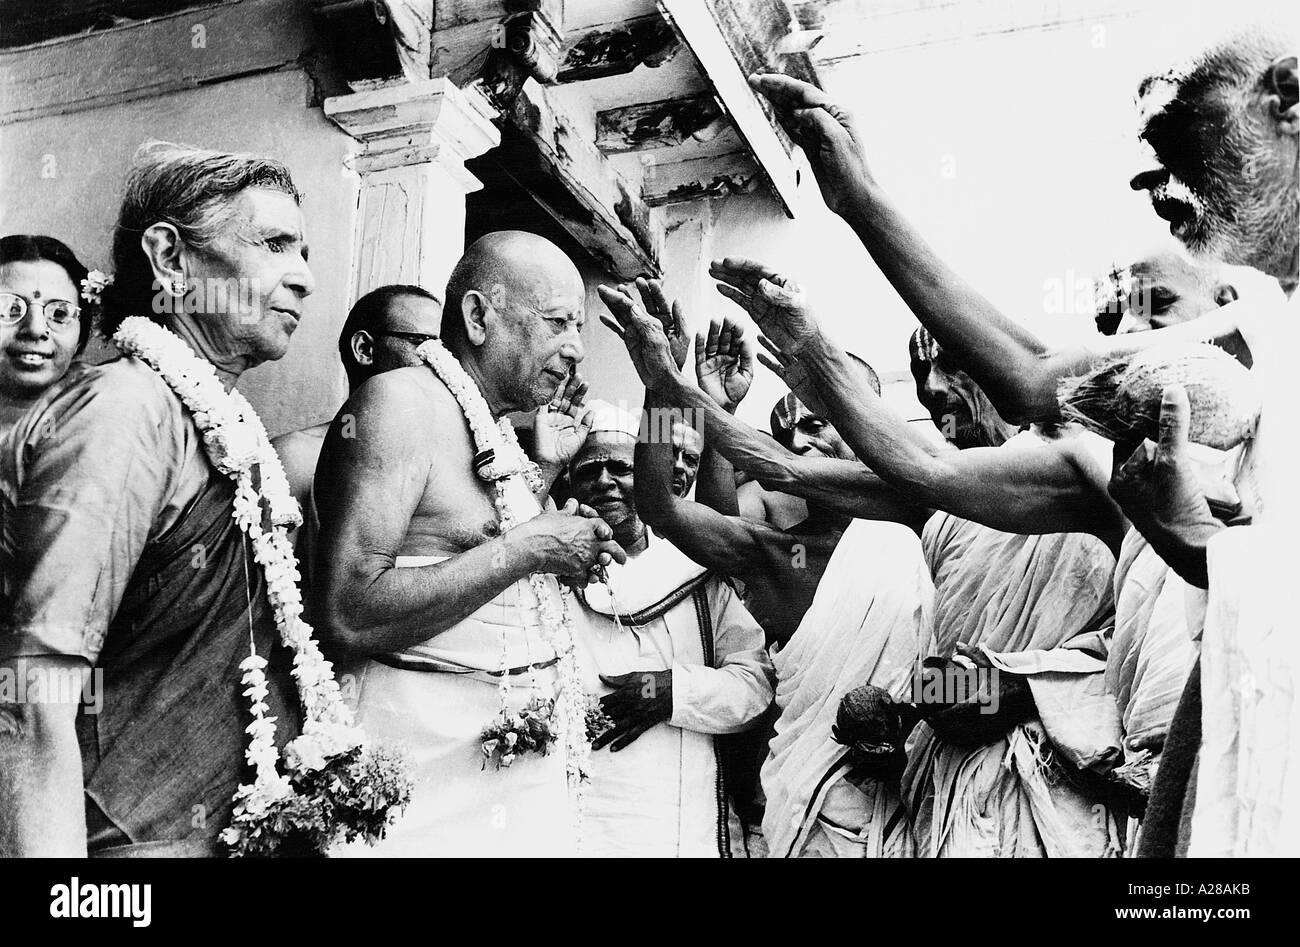 TSS76397 Venerable looking Krishna Iyenger India - Stock Image